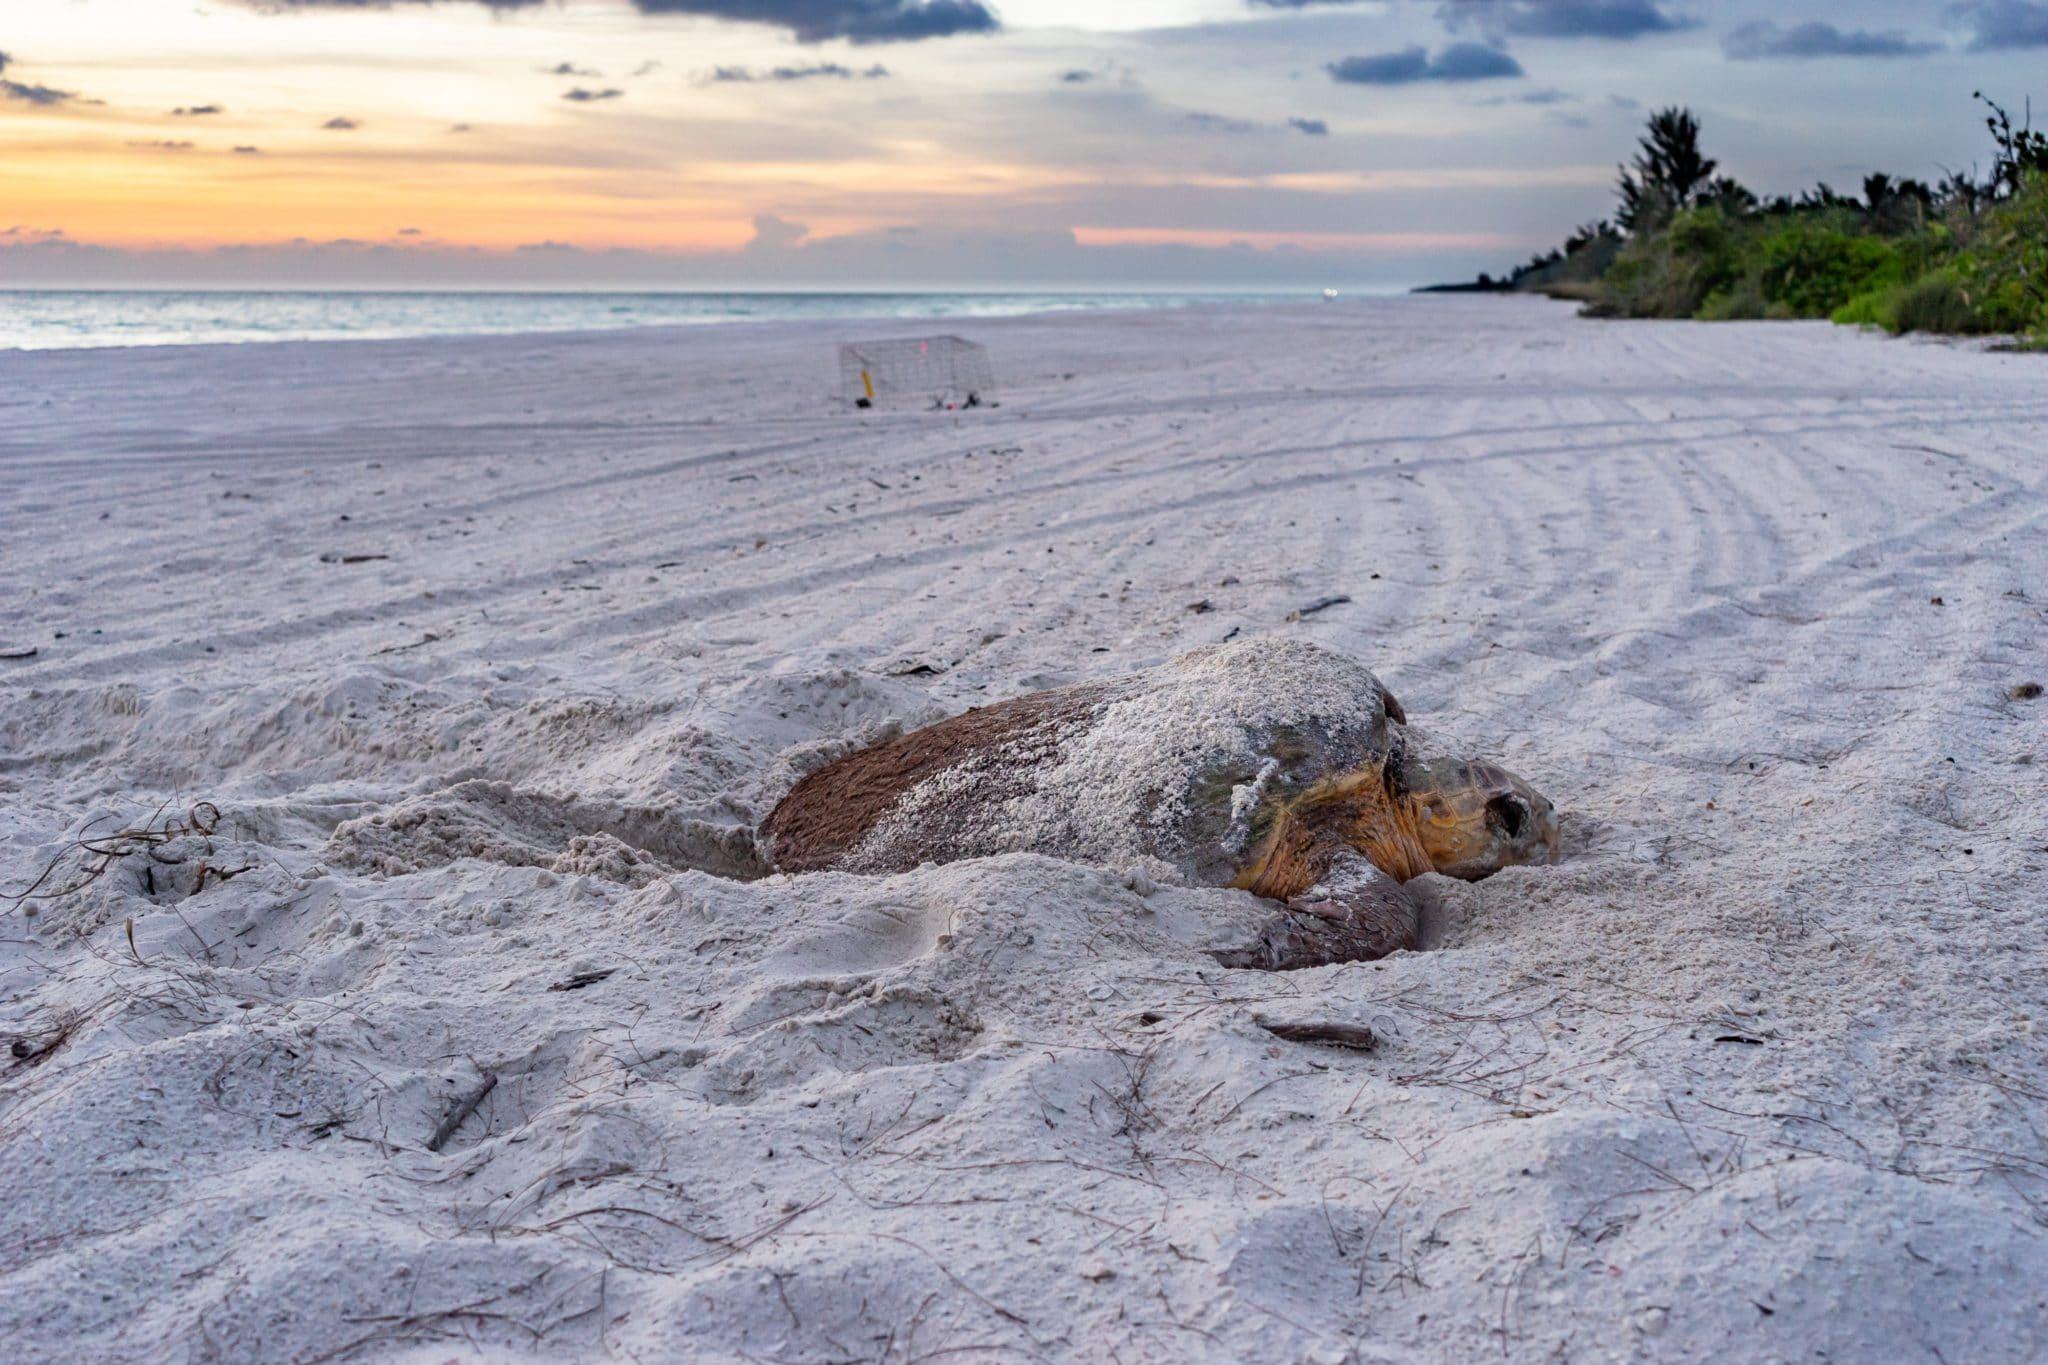 Loggerhead nesting on Keewaydin Island